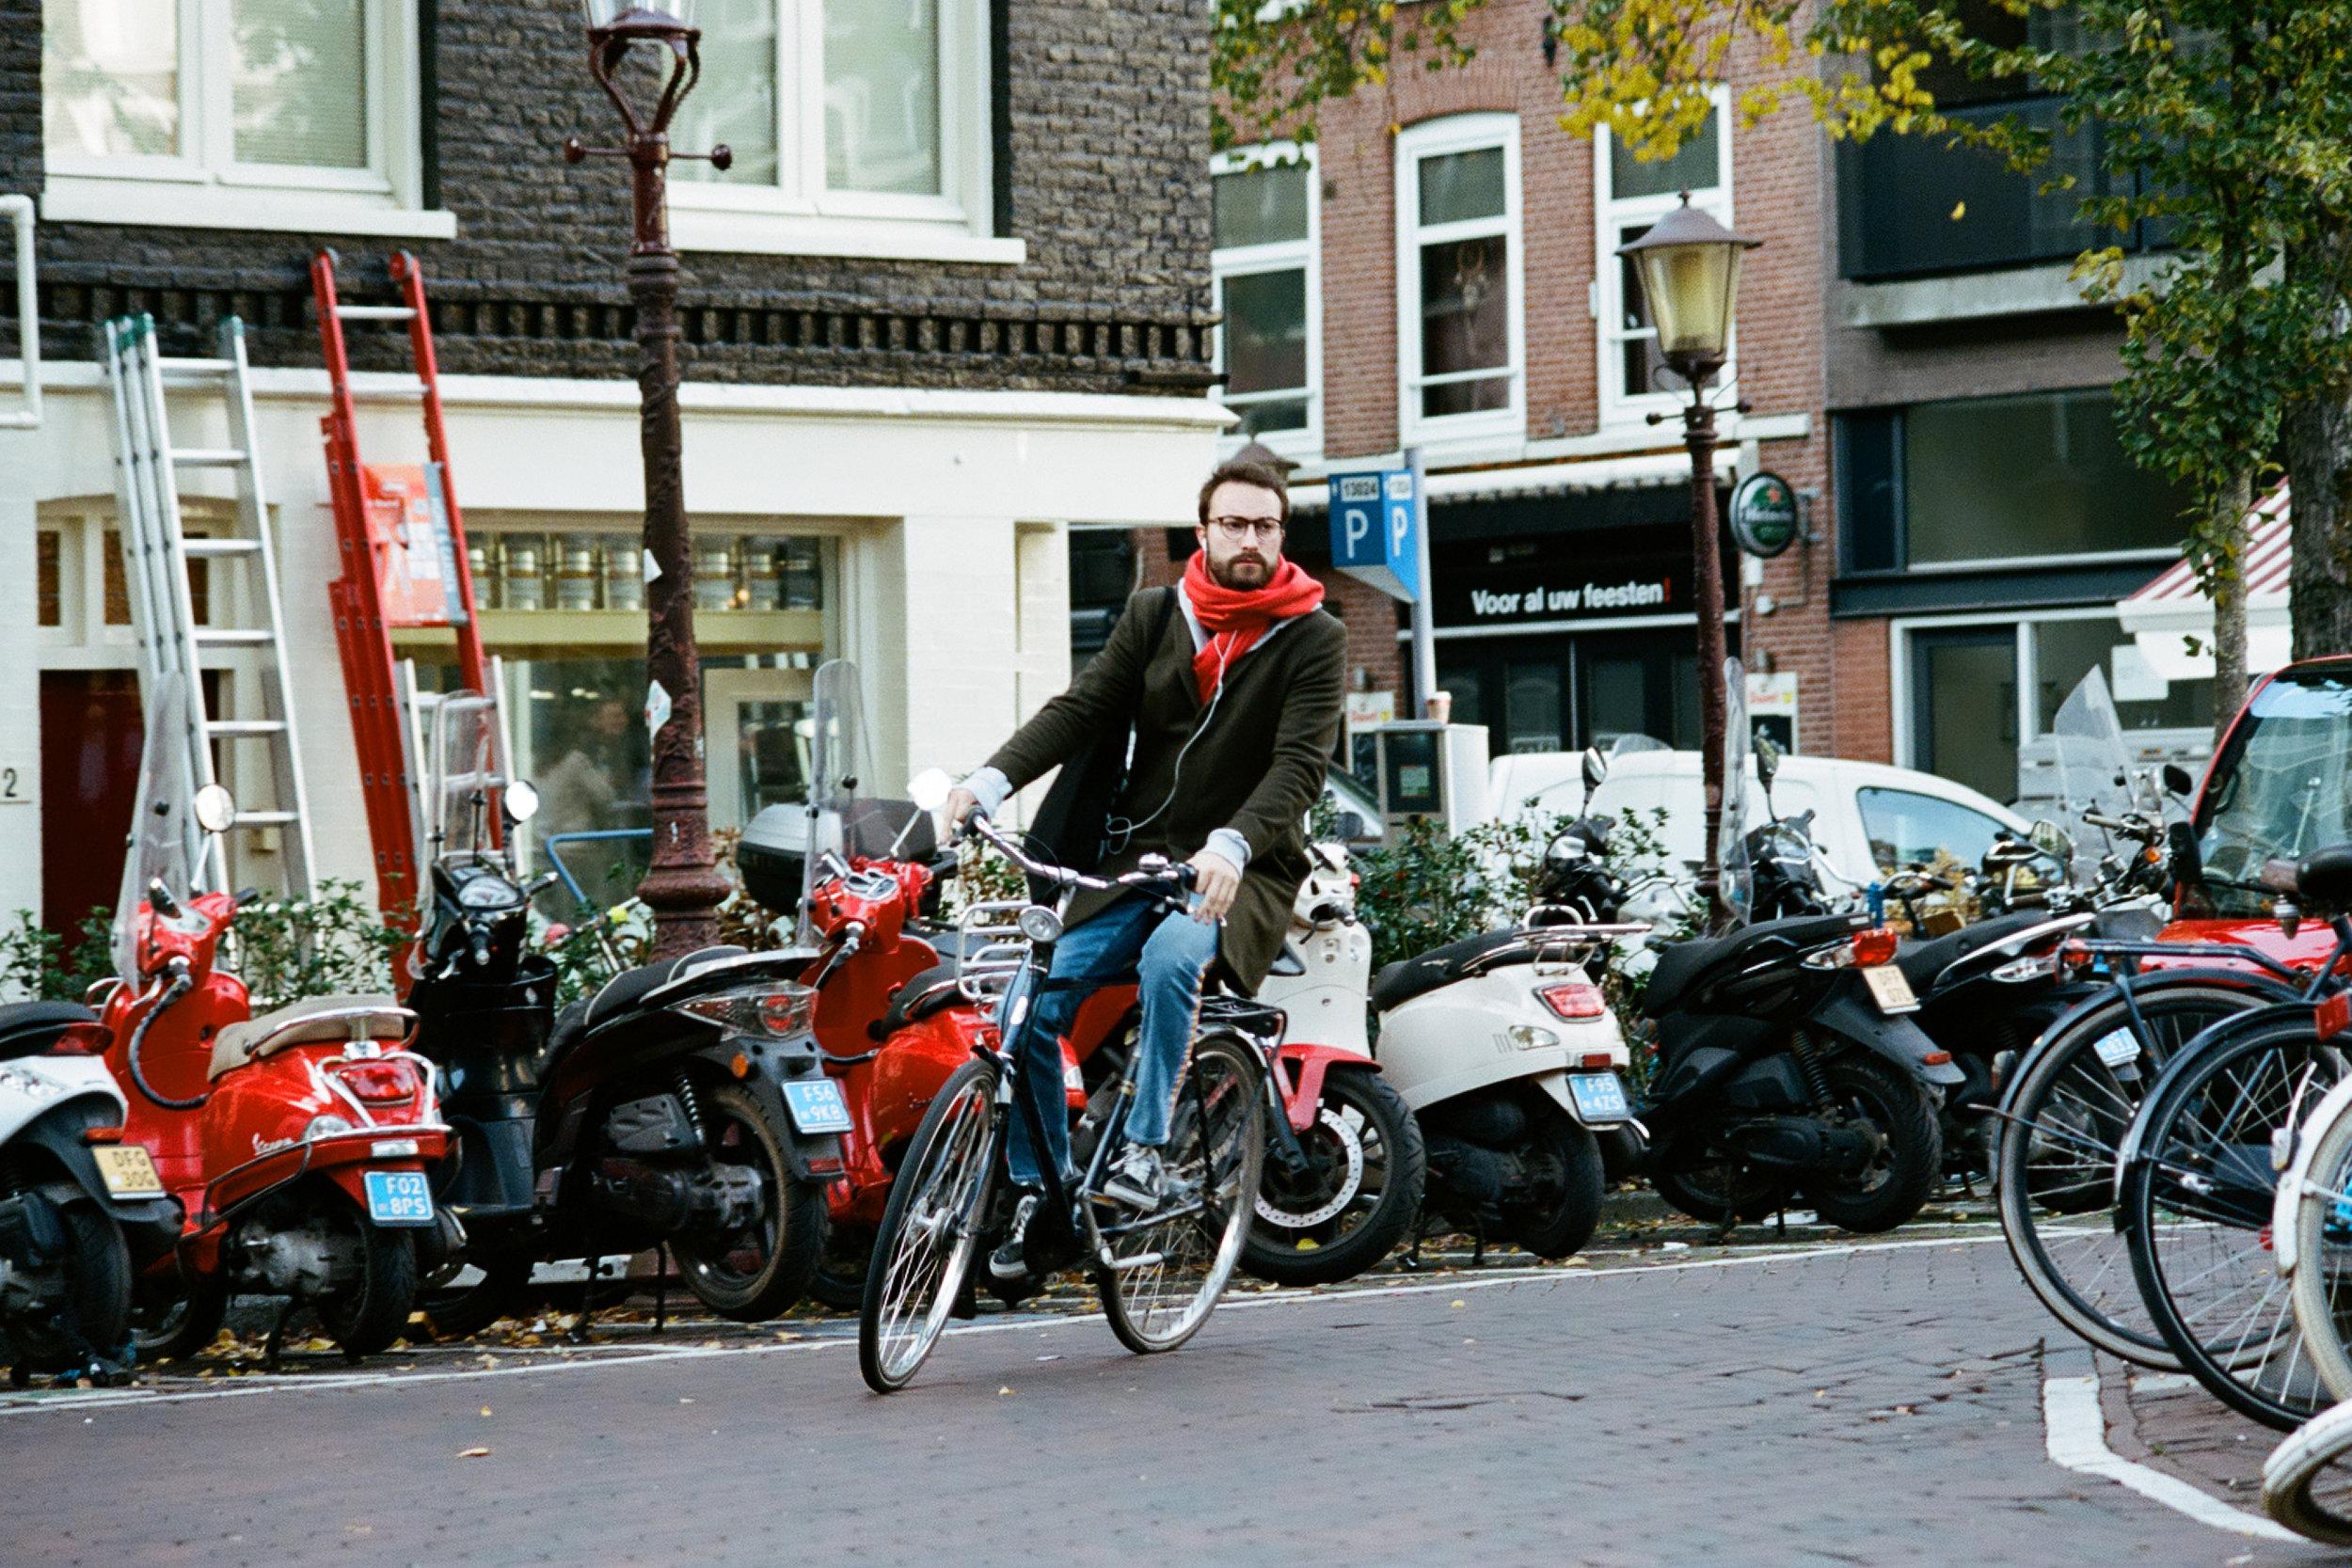 Amsterdam_0060 copy.jpg